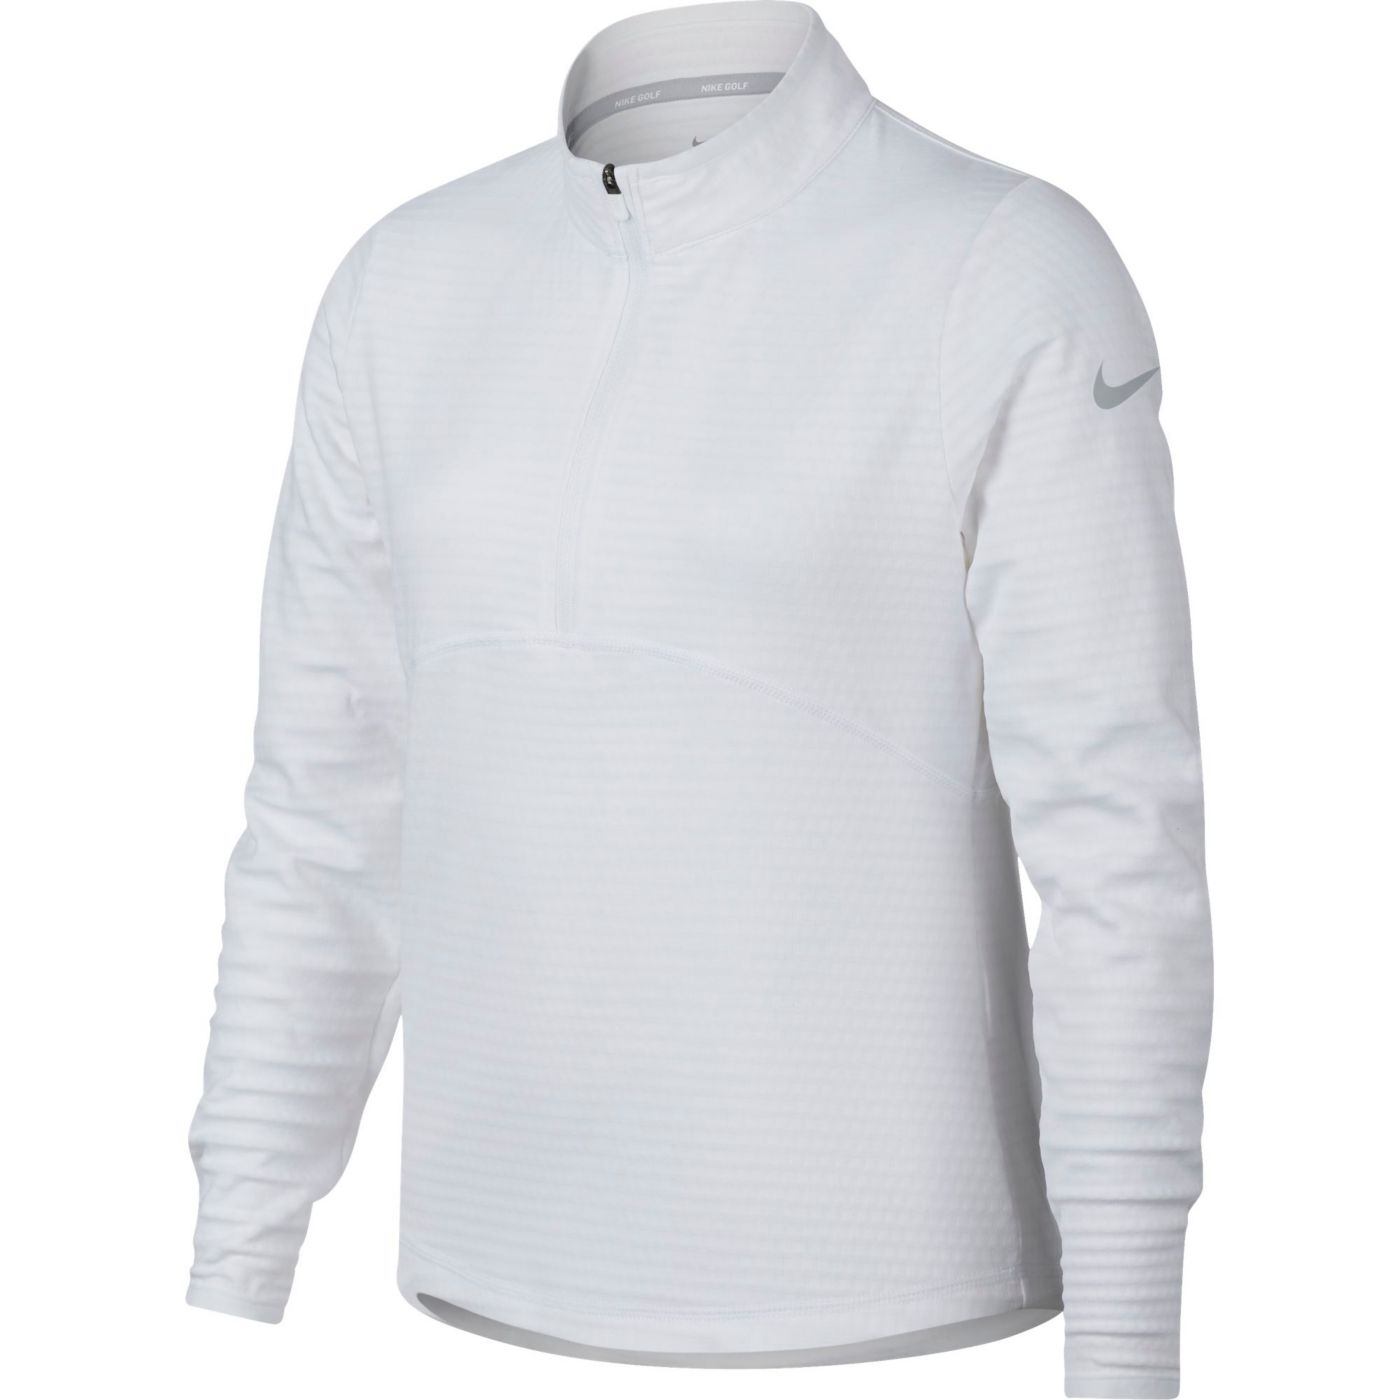 Nike Girls' Dry Long Sleeve Golf Top